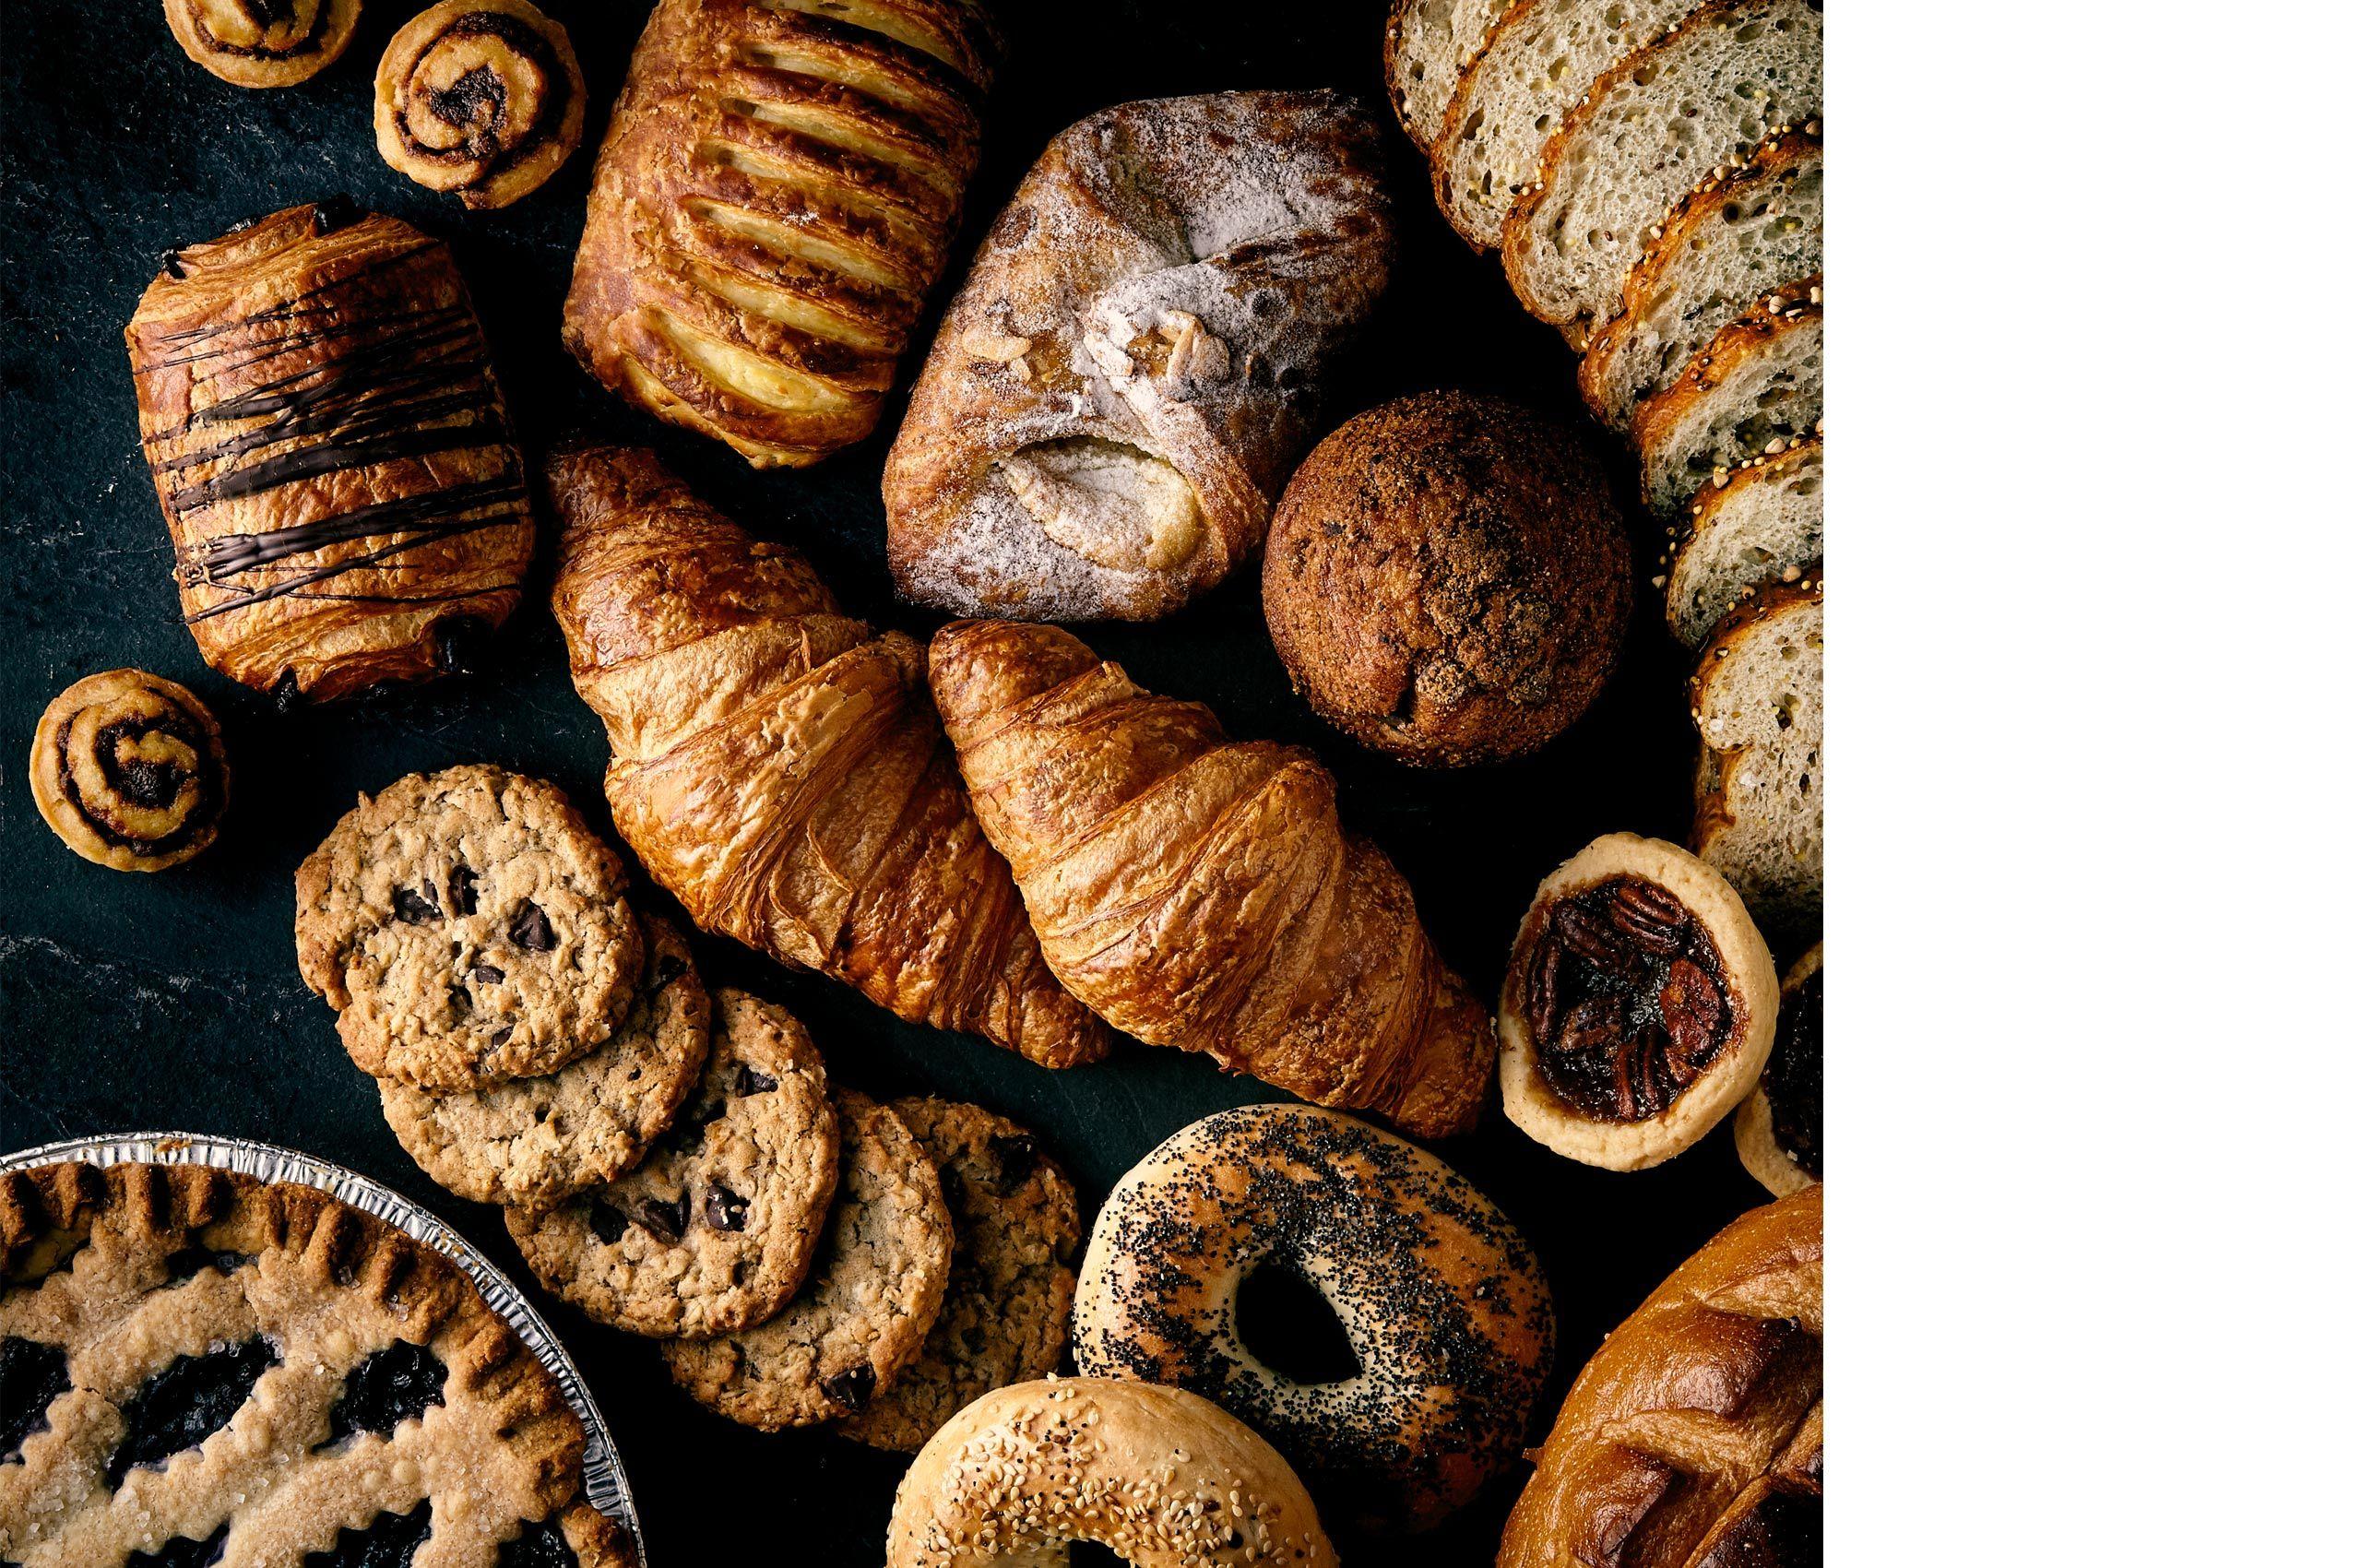 Livebooks_new-_Bakery.jpg